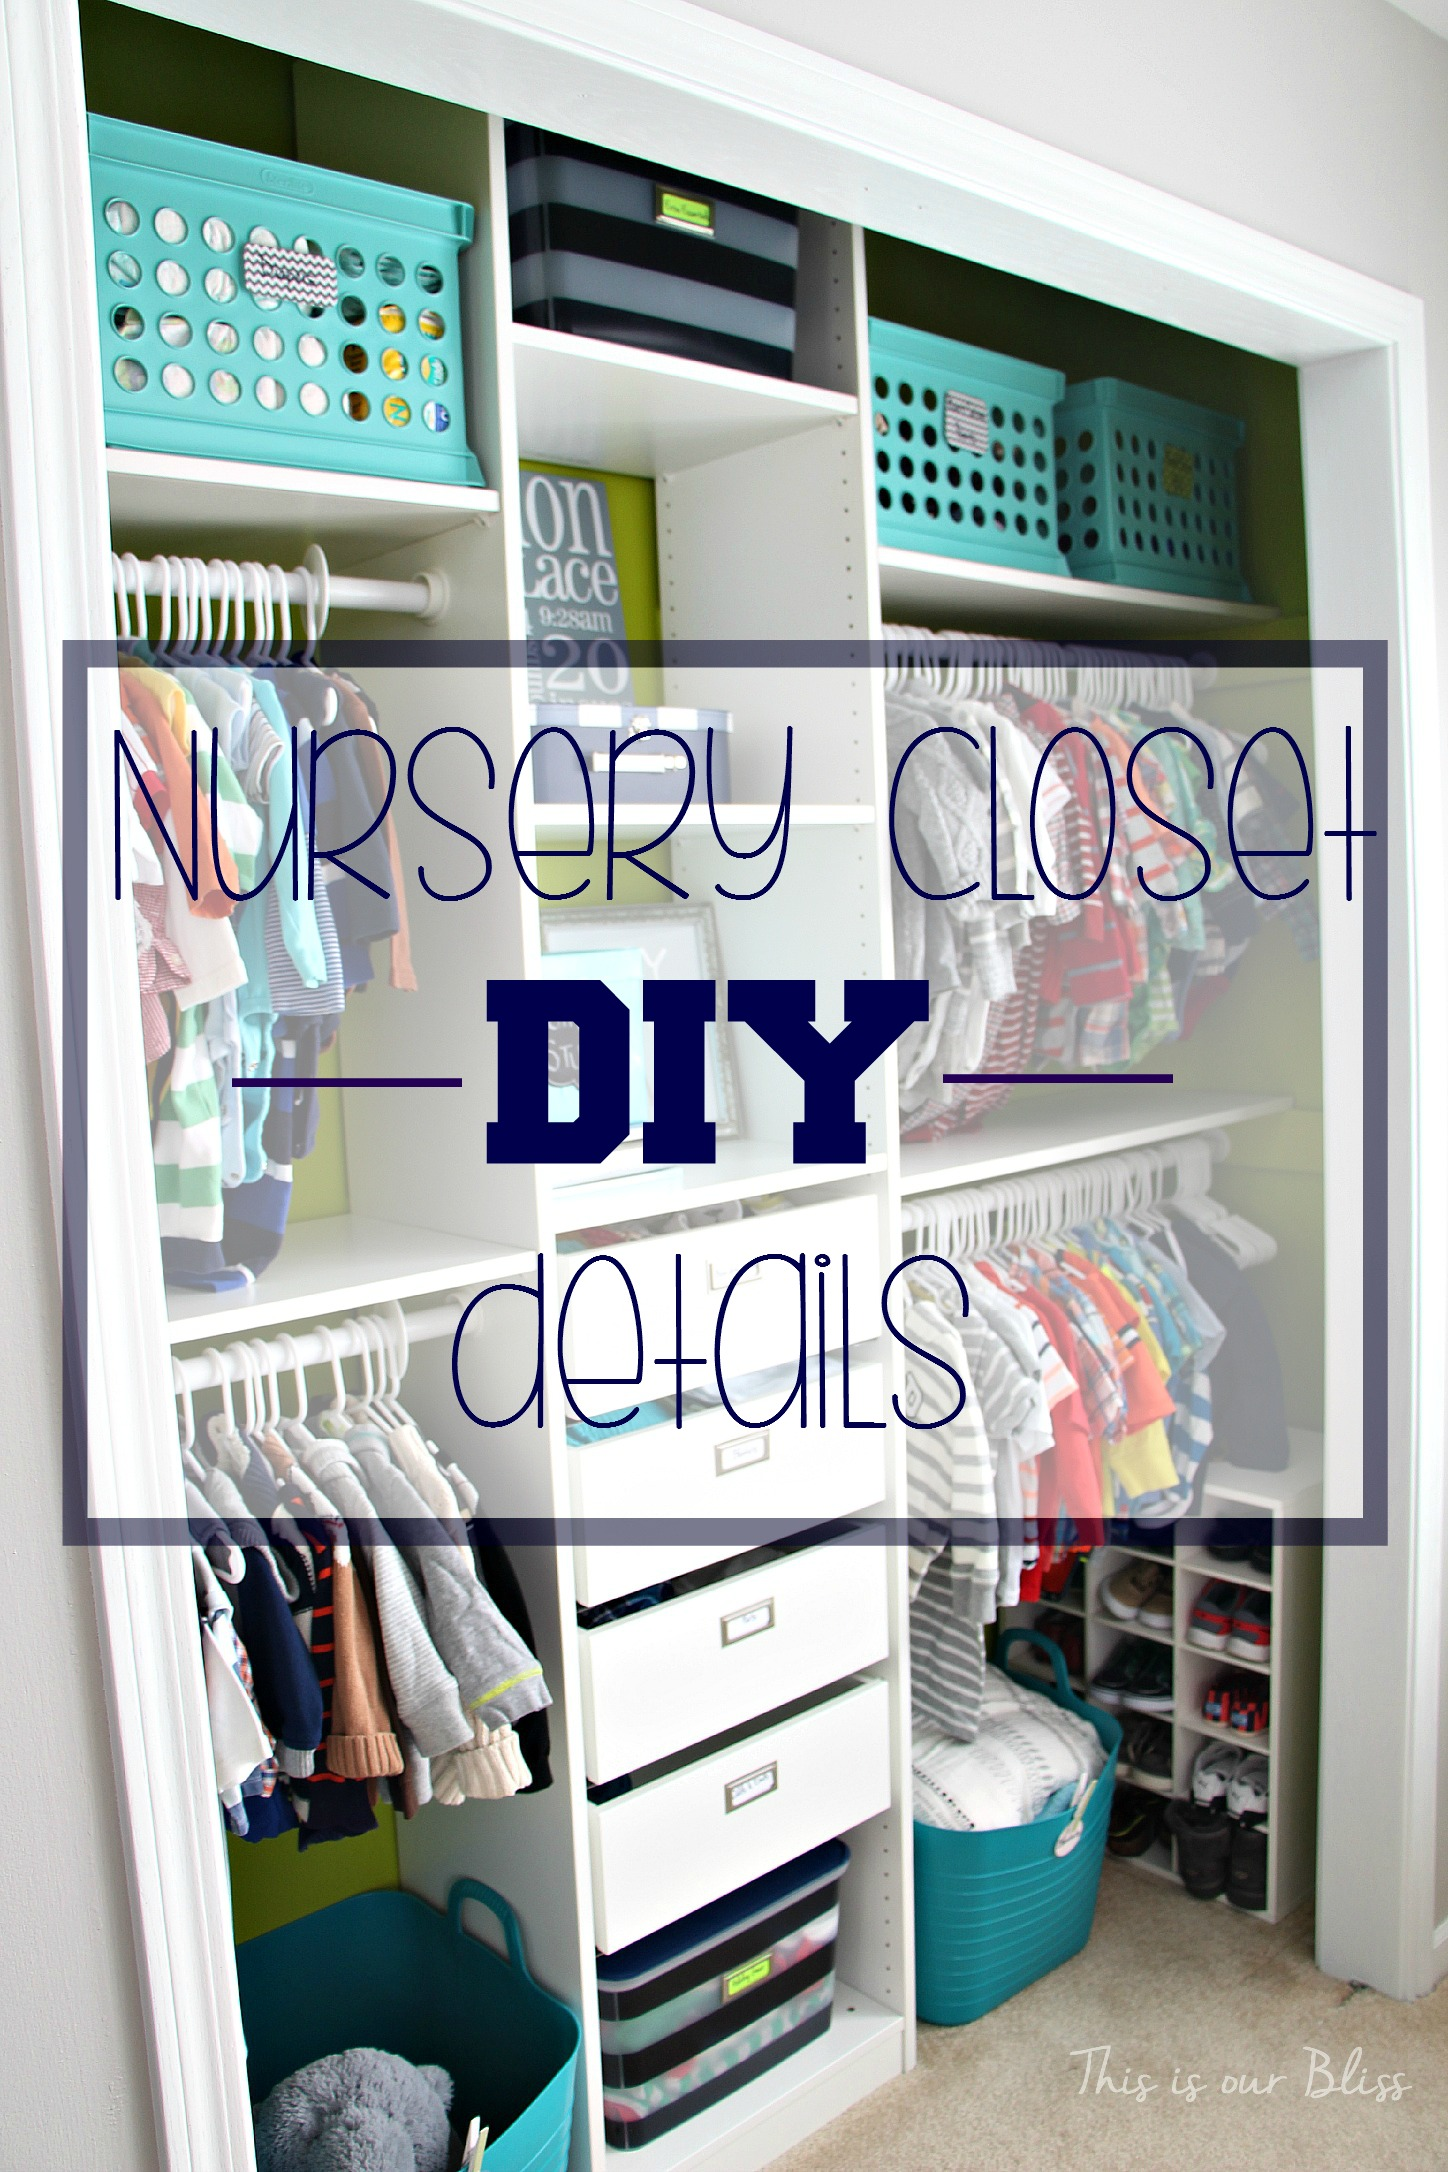 Baby Boy Nursery Closet DIY Details | How to DIY a Custom Nursery Closet | This is our Bliss | www.thisisourbliss.com